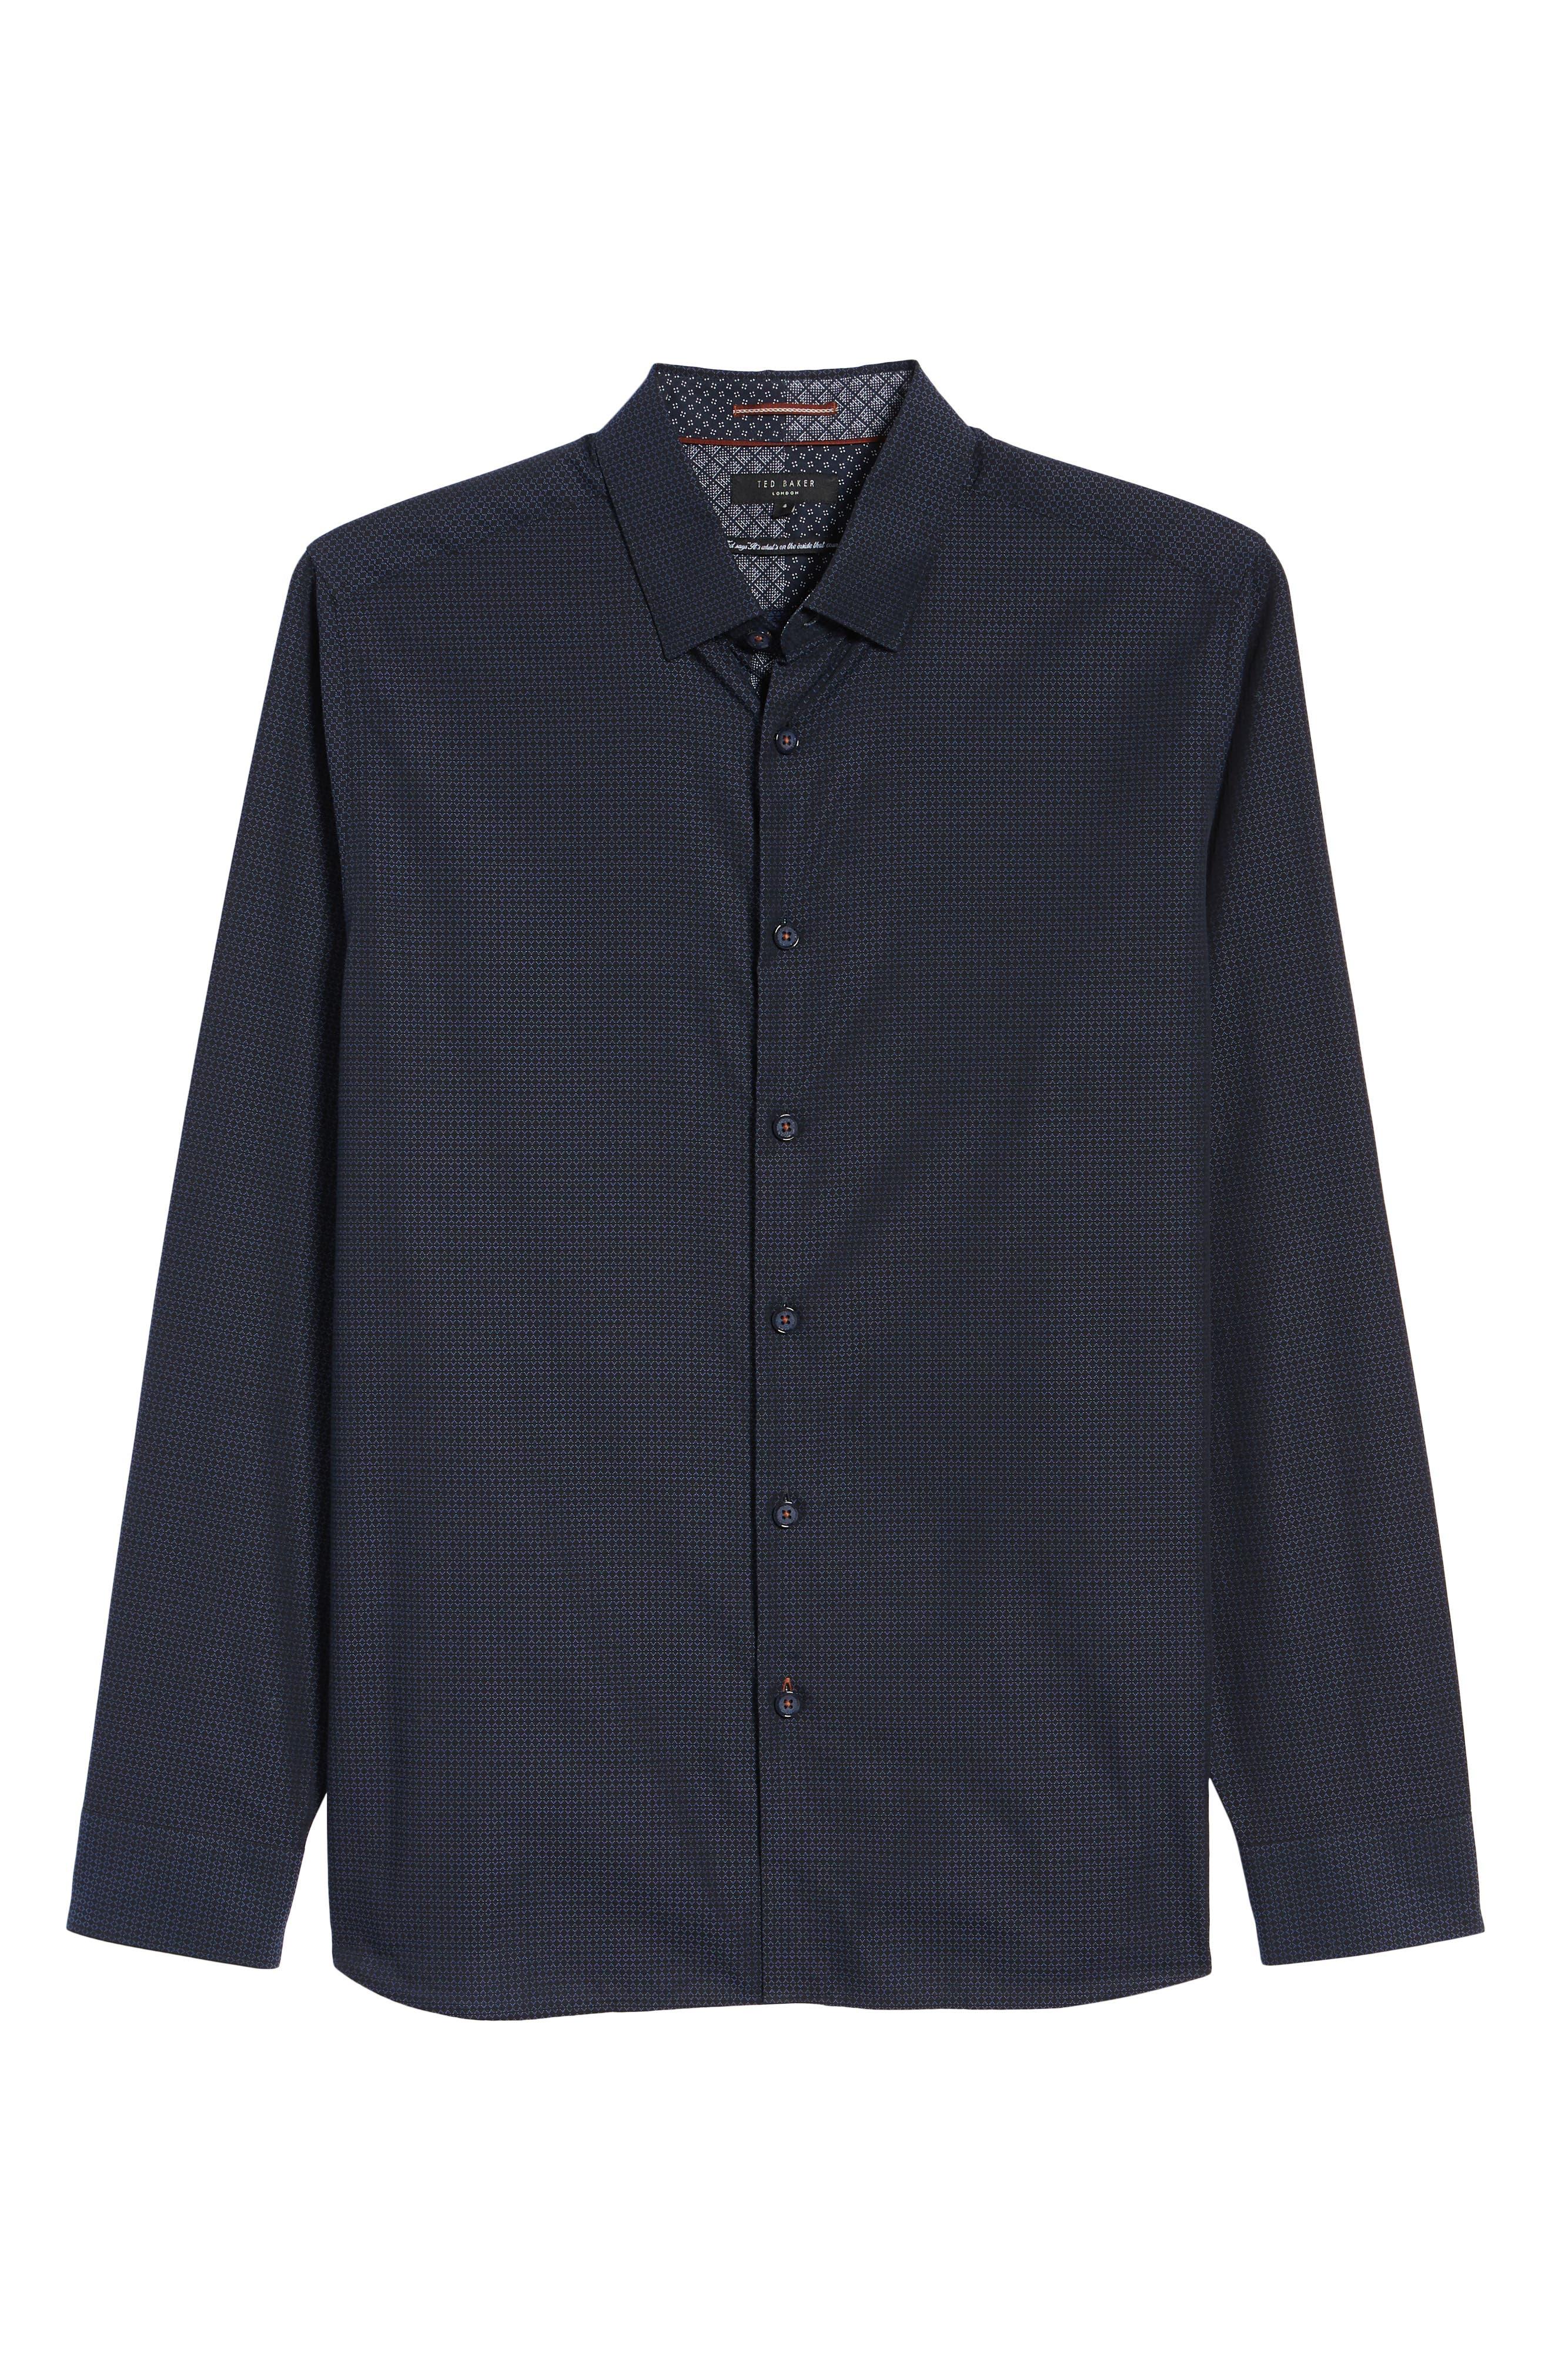 Myll Slim Fit Jacquard Sport Shirt,                             Alternate thumbnail 5, color,                             NAVY